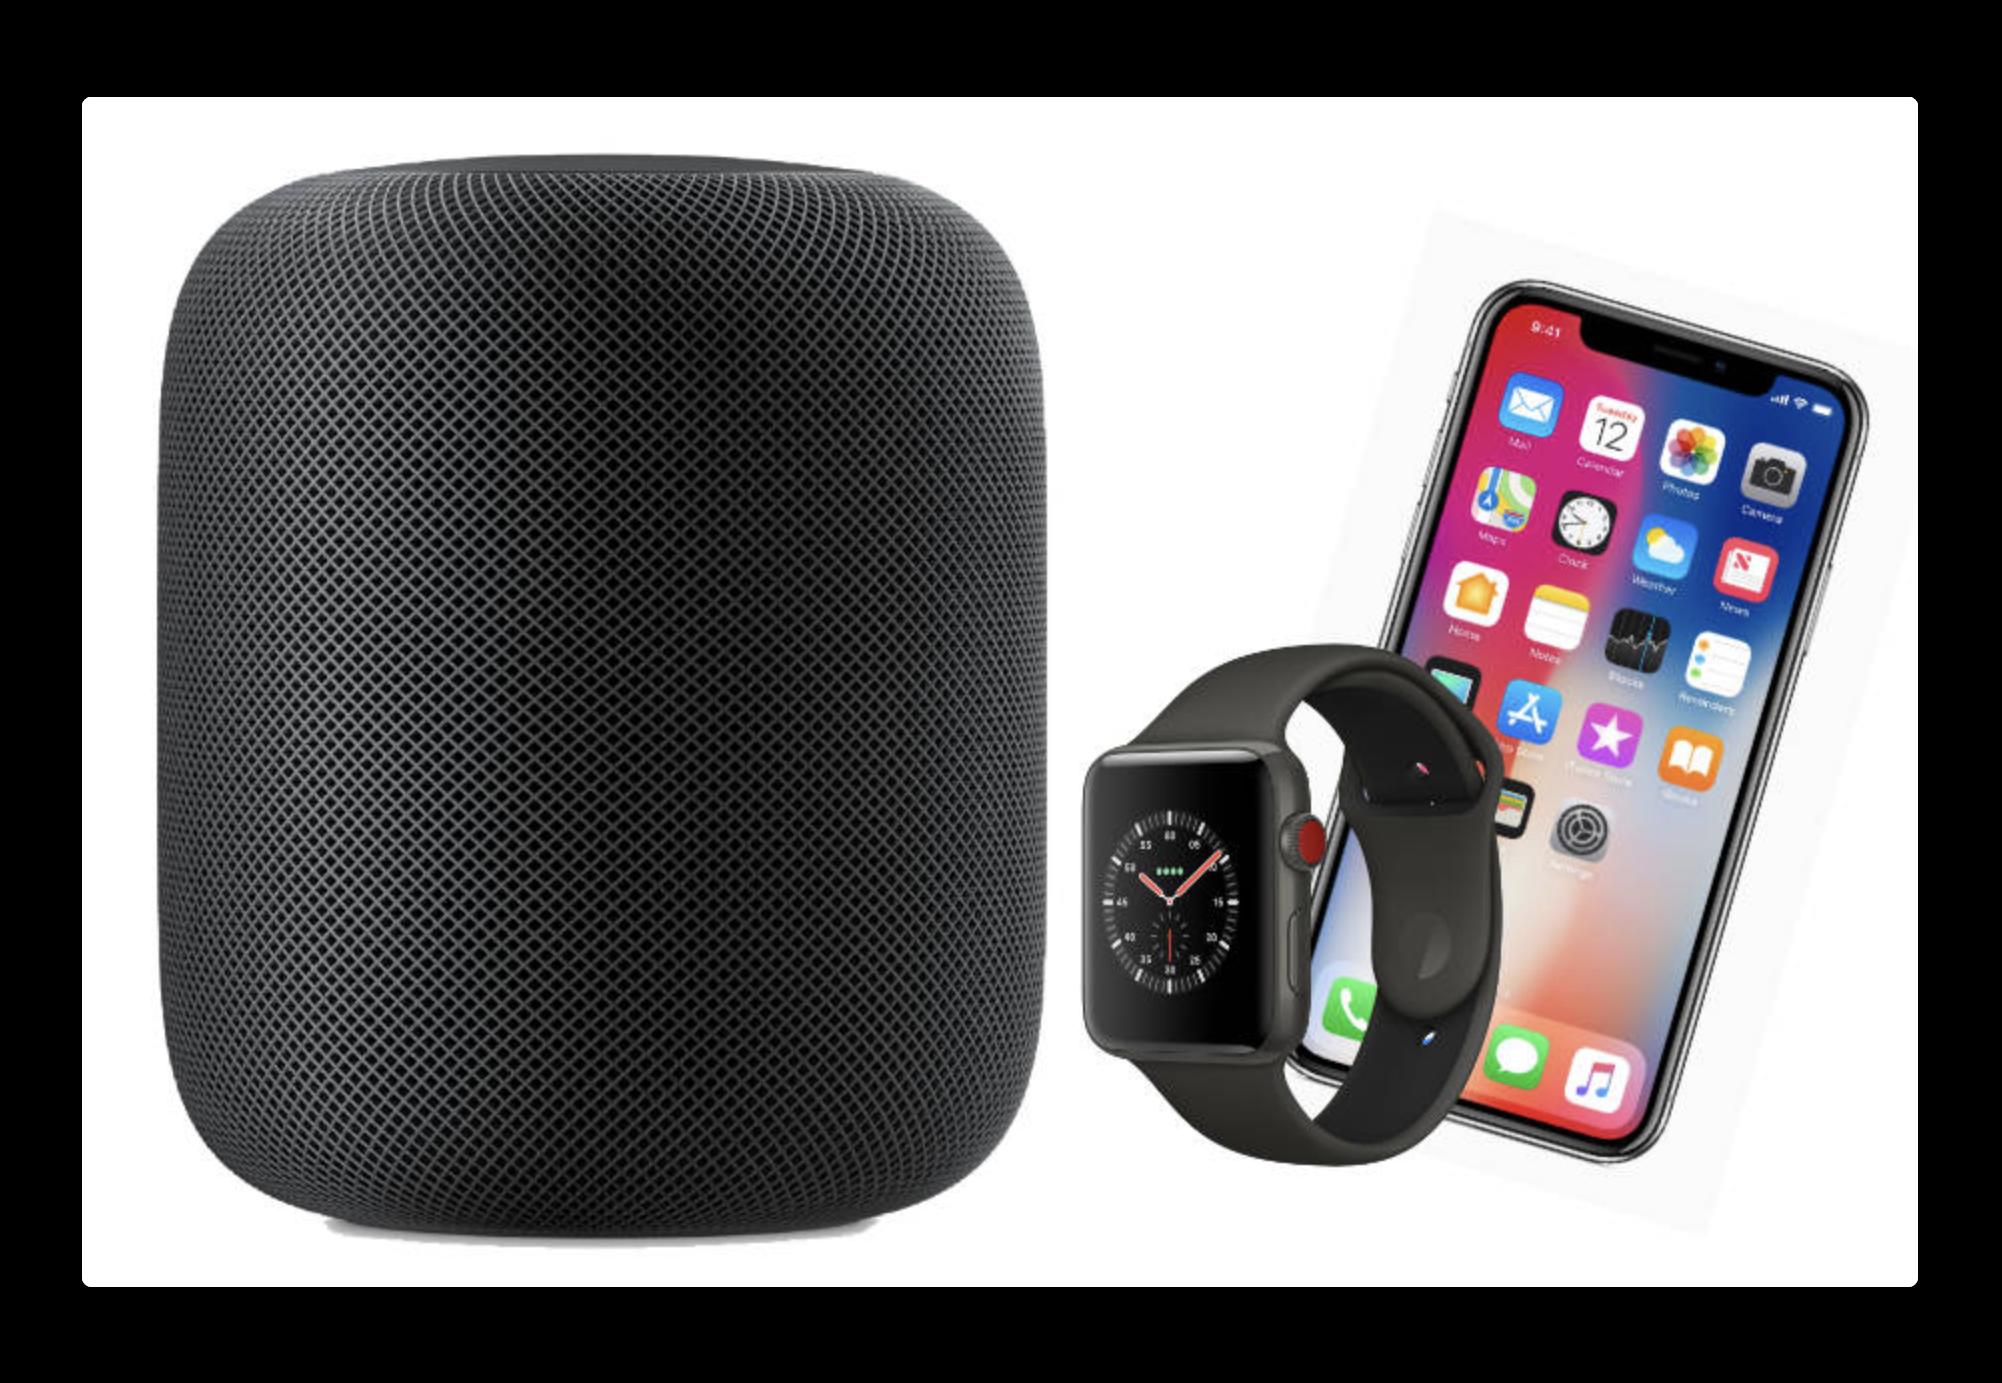 Apple、世界で最も革新的な50社の年間ランキングでトップ